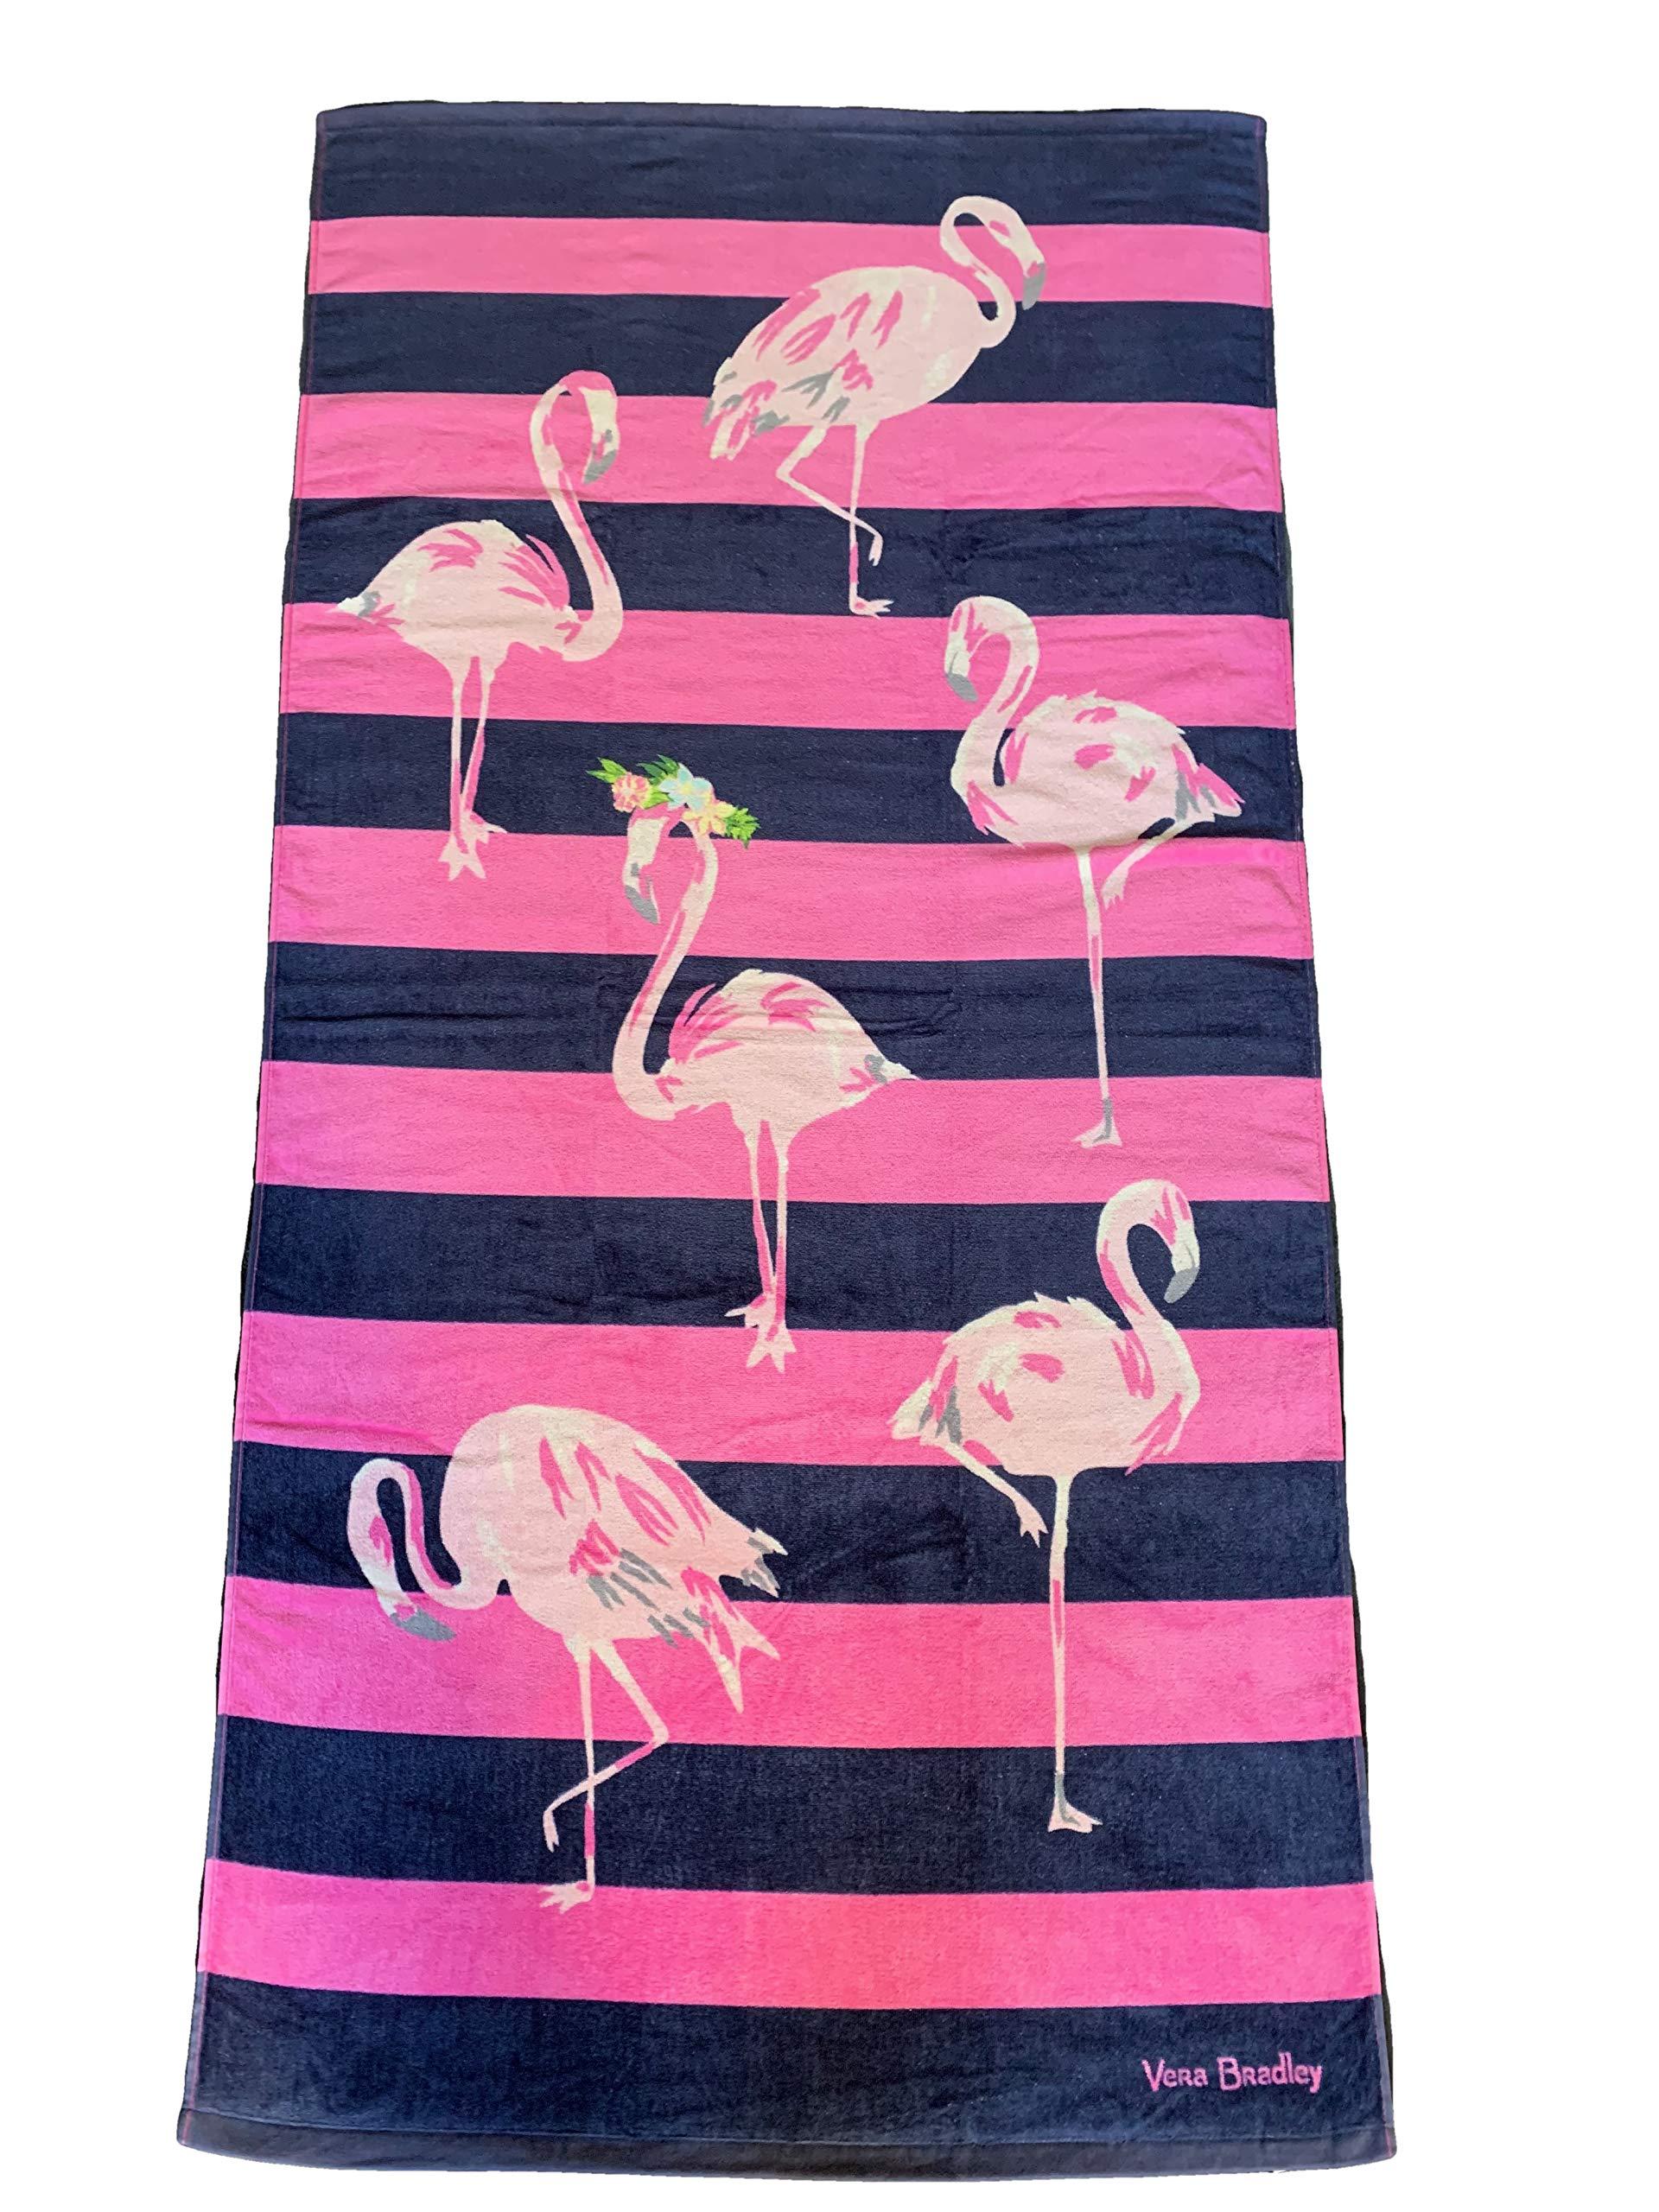 Vera Bradley Flamingo Fiesta Beach Towel 33'' x 66'' by Vera Bradley (Image #1)